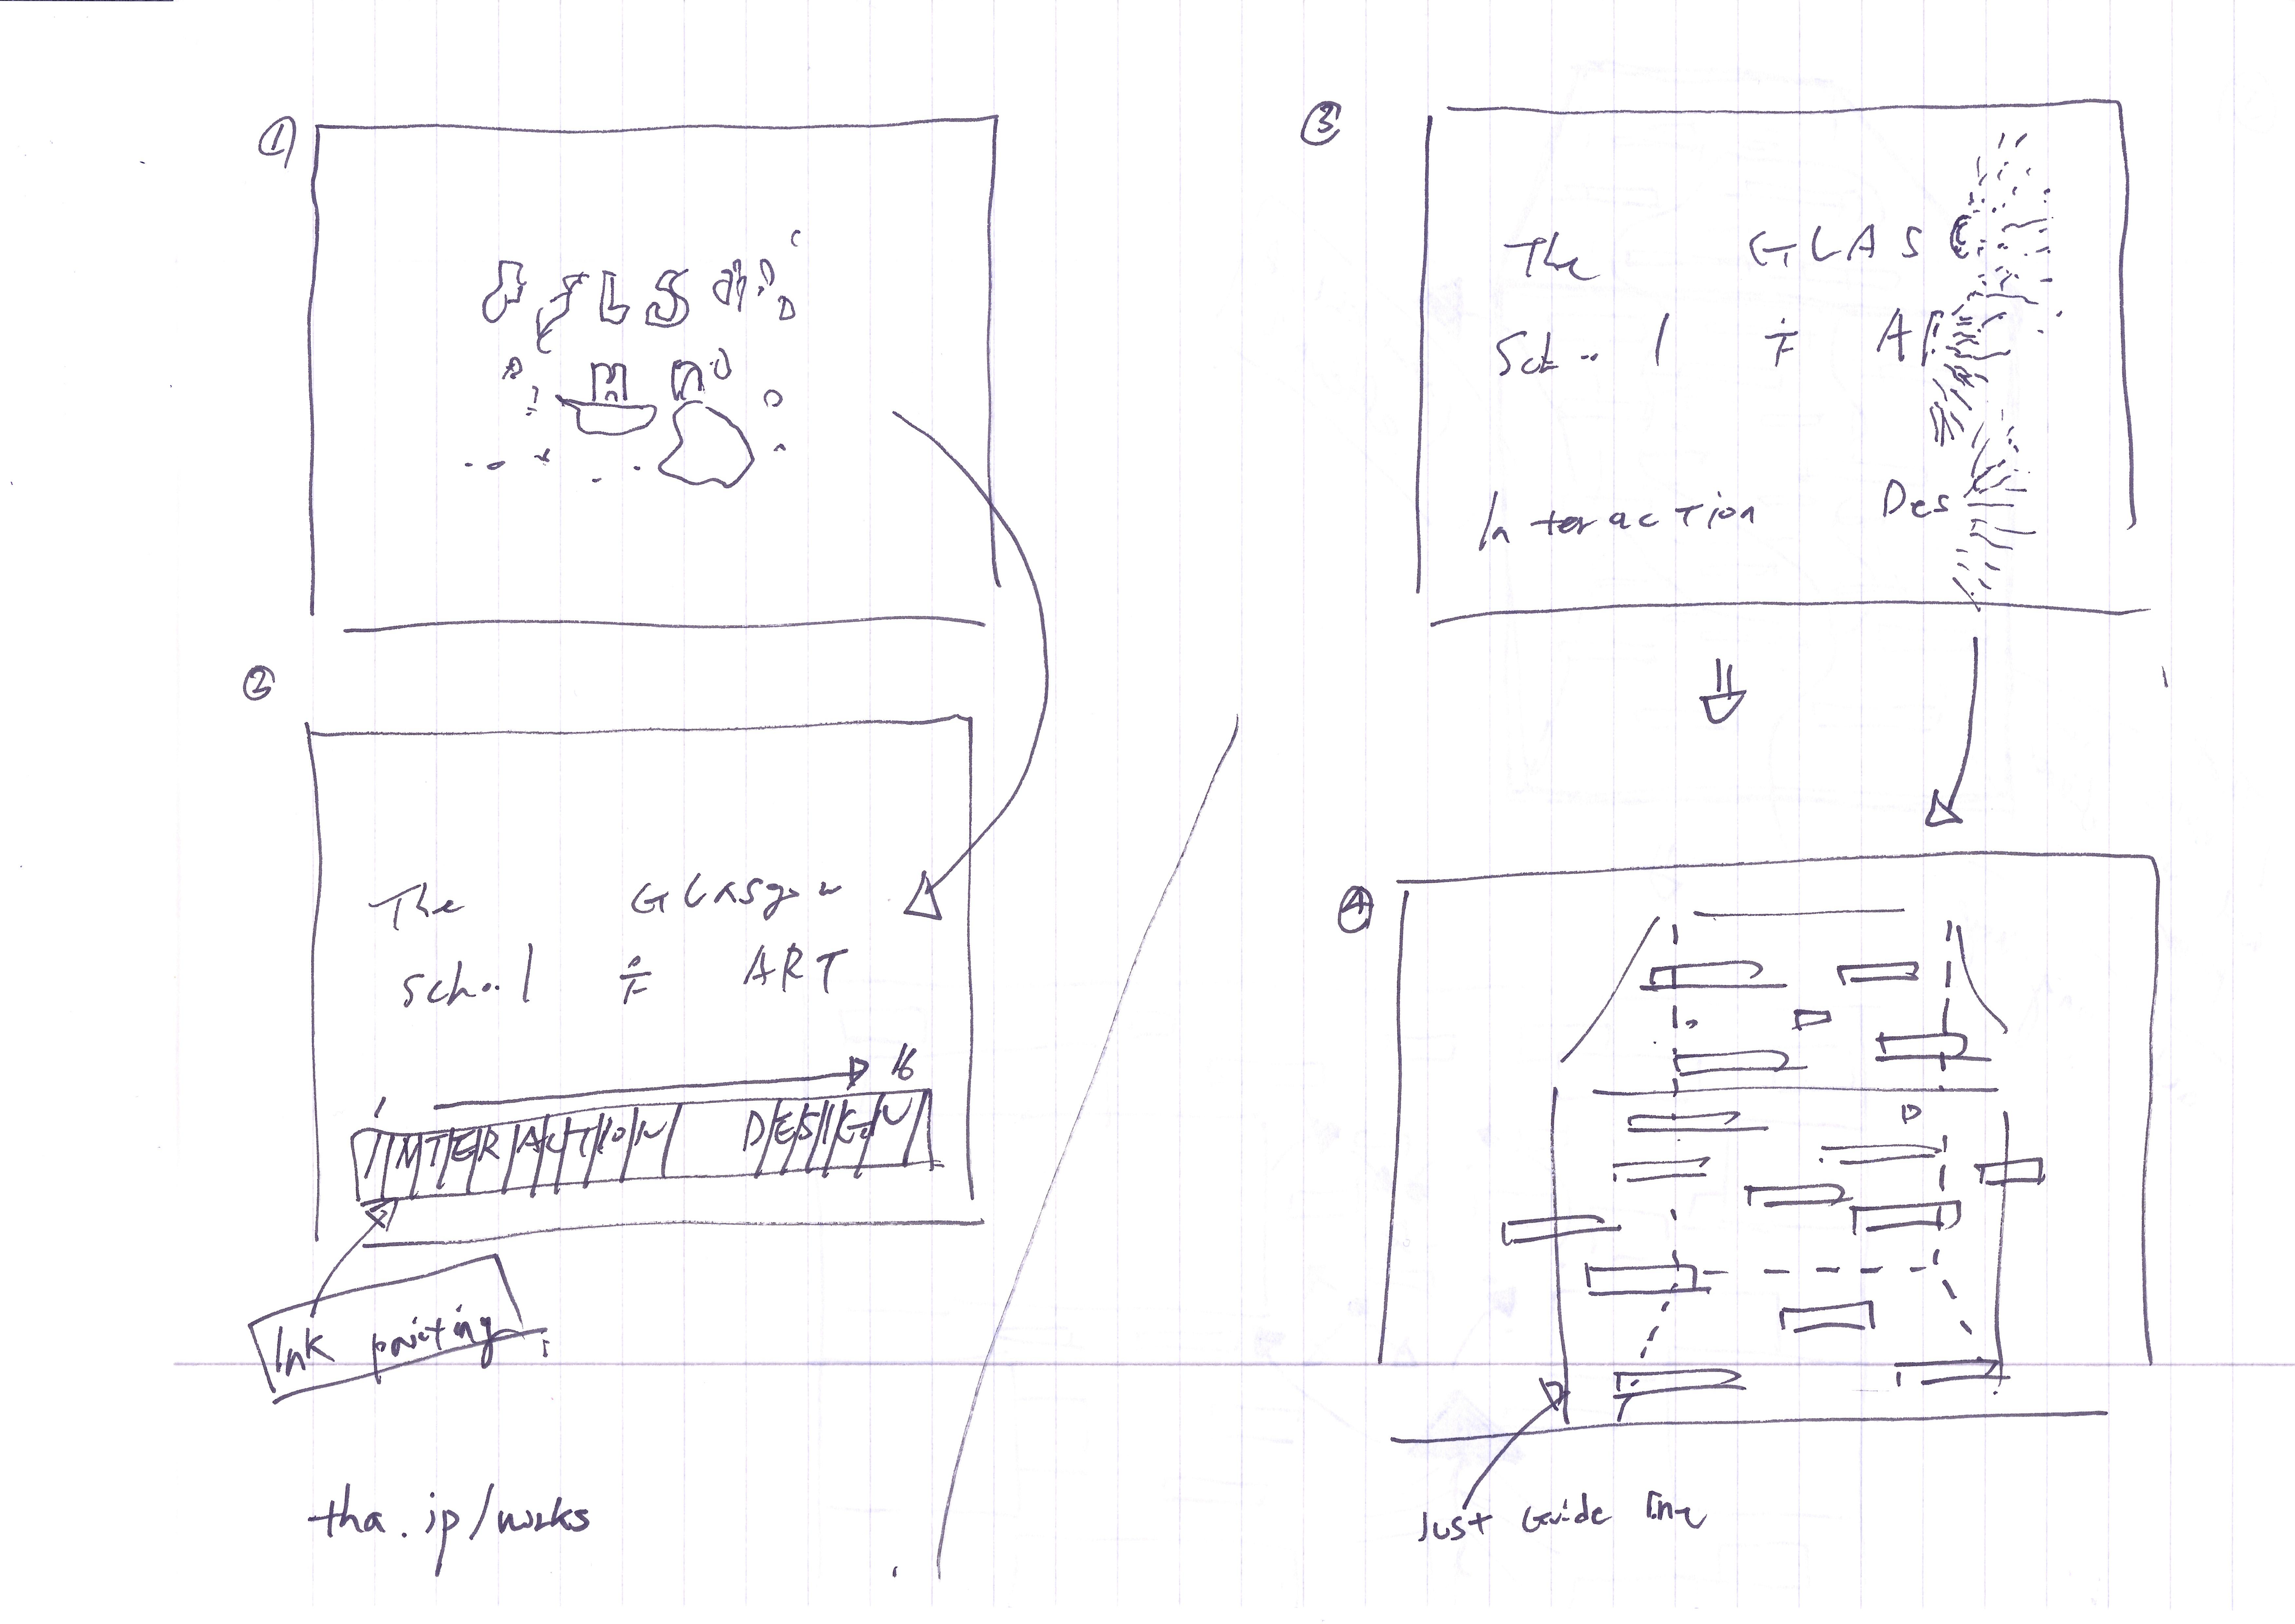 EPSON053.JPG